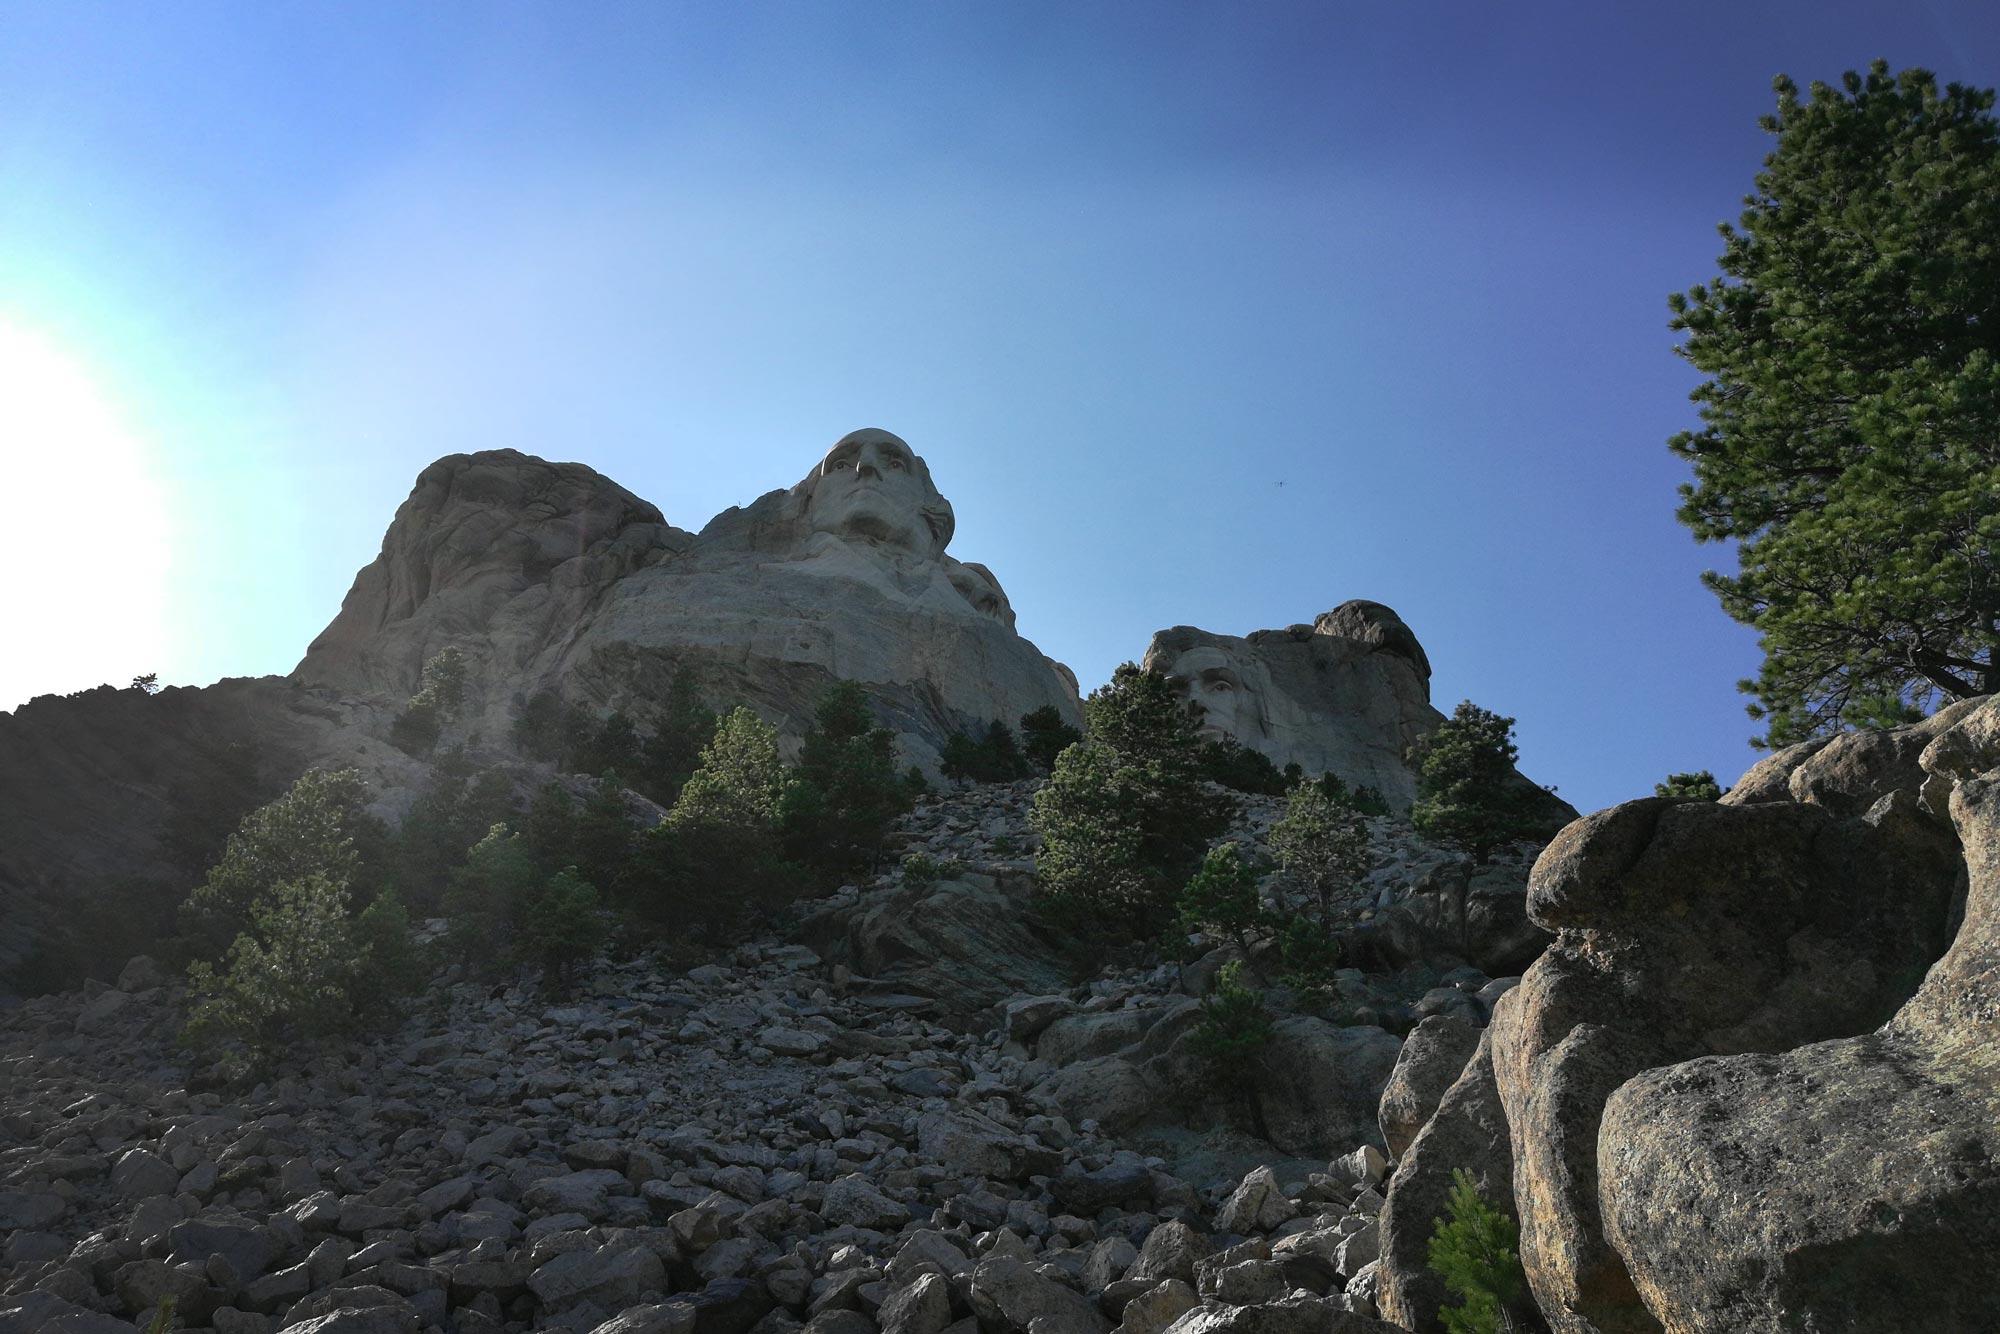 View of presidents at Mount Rushmore National Memorial, Keystone, South Dakota